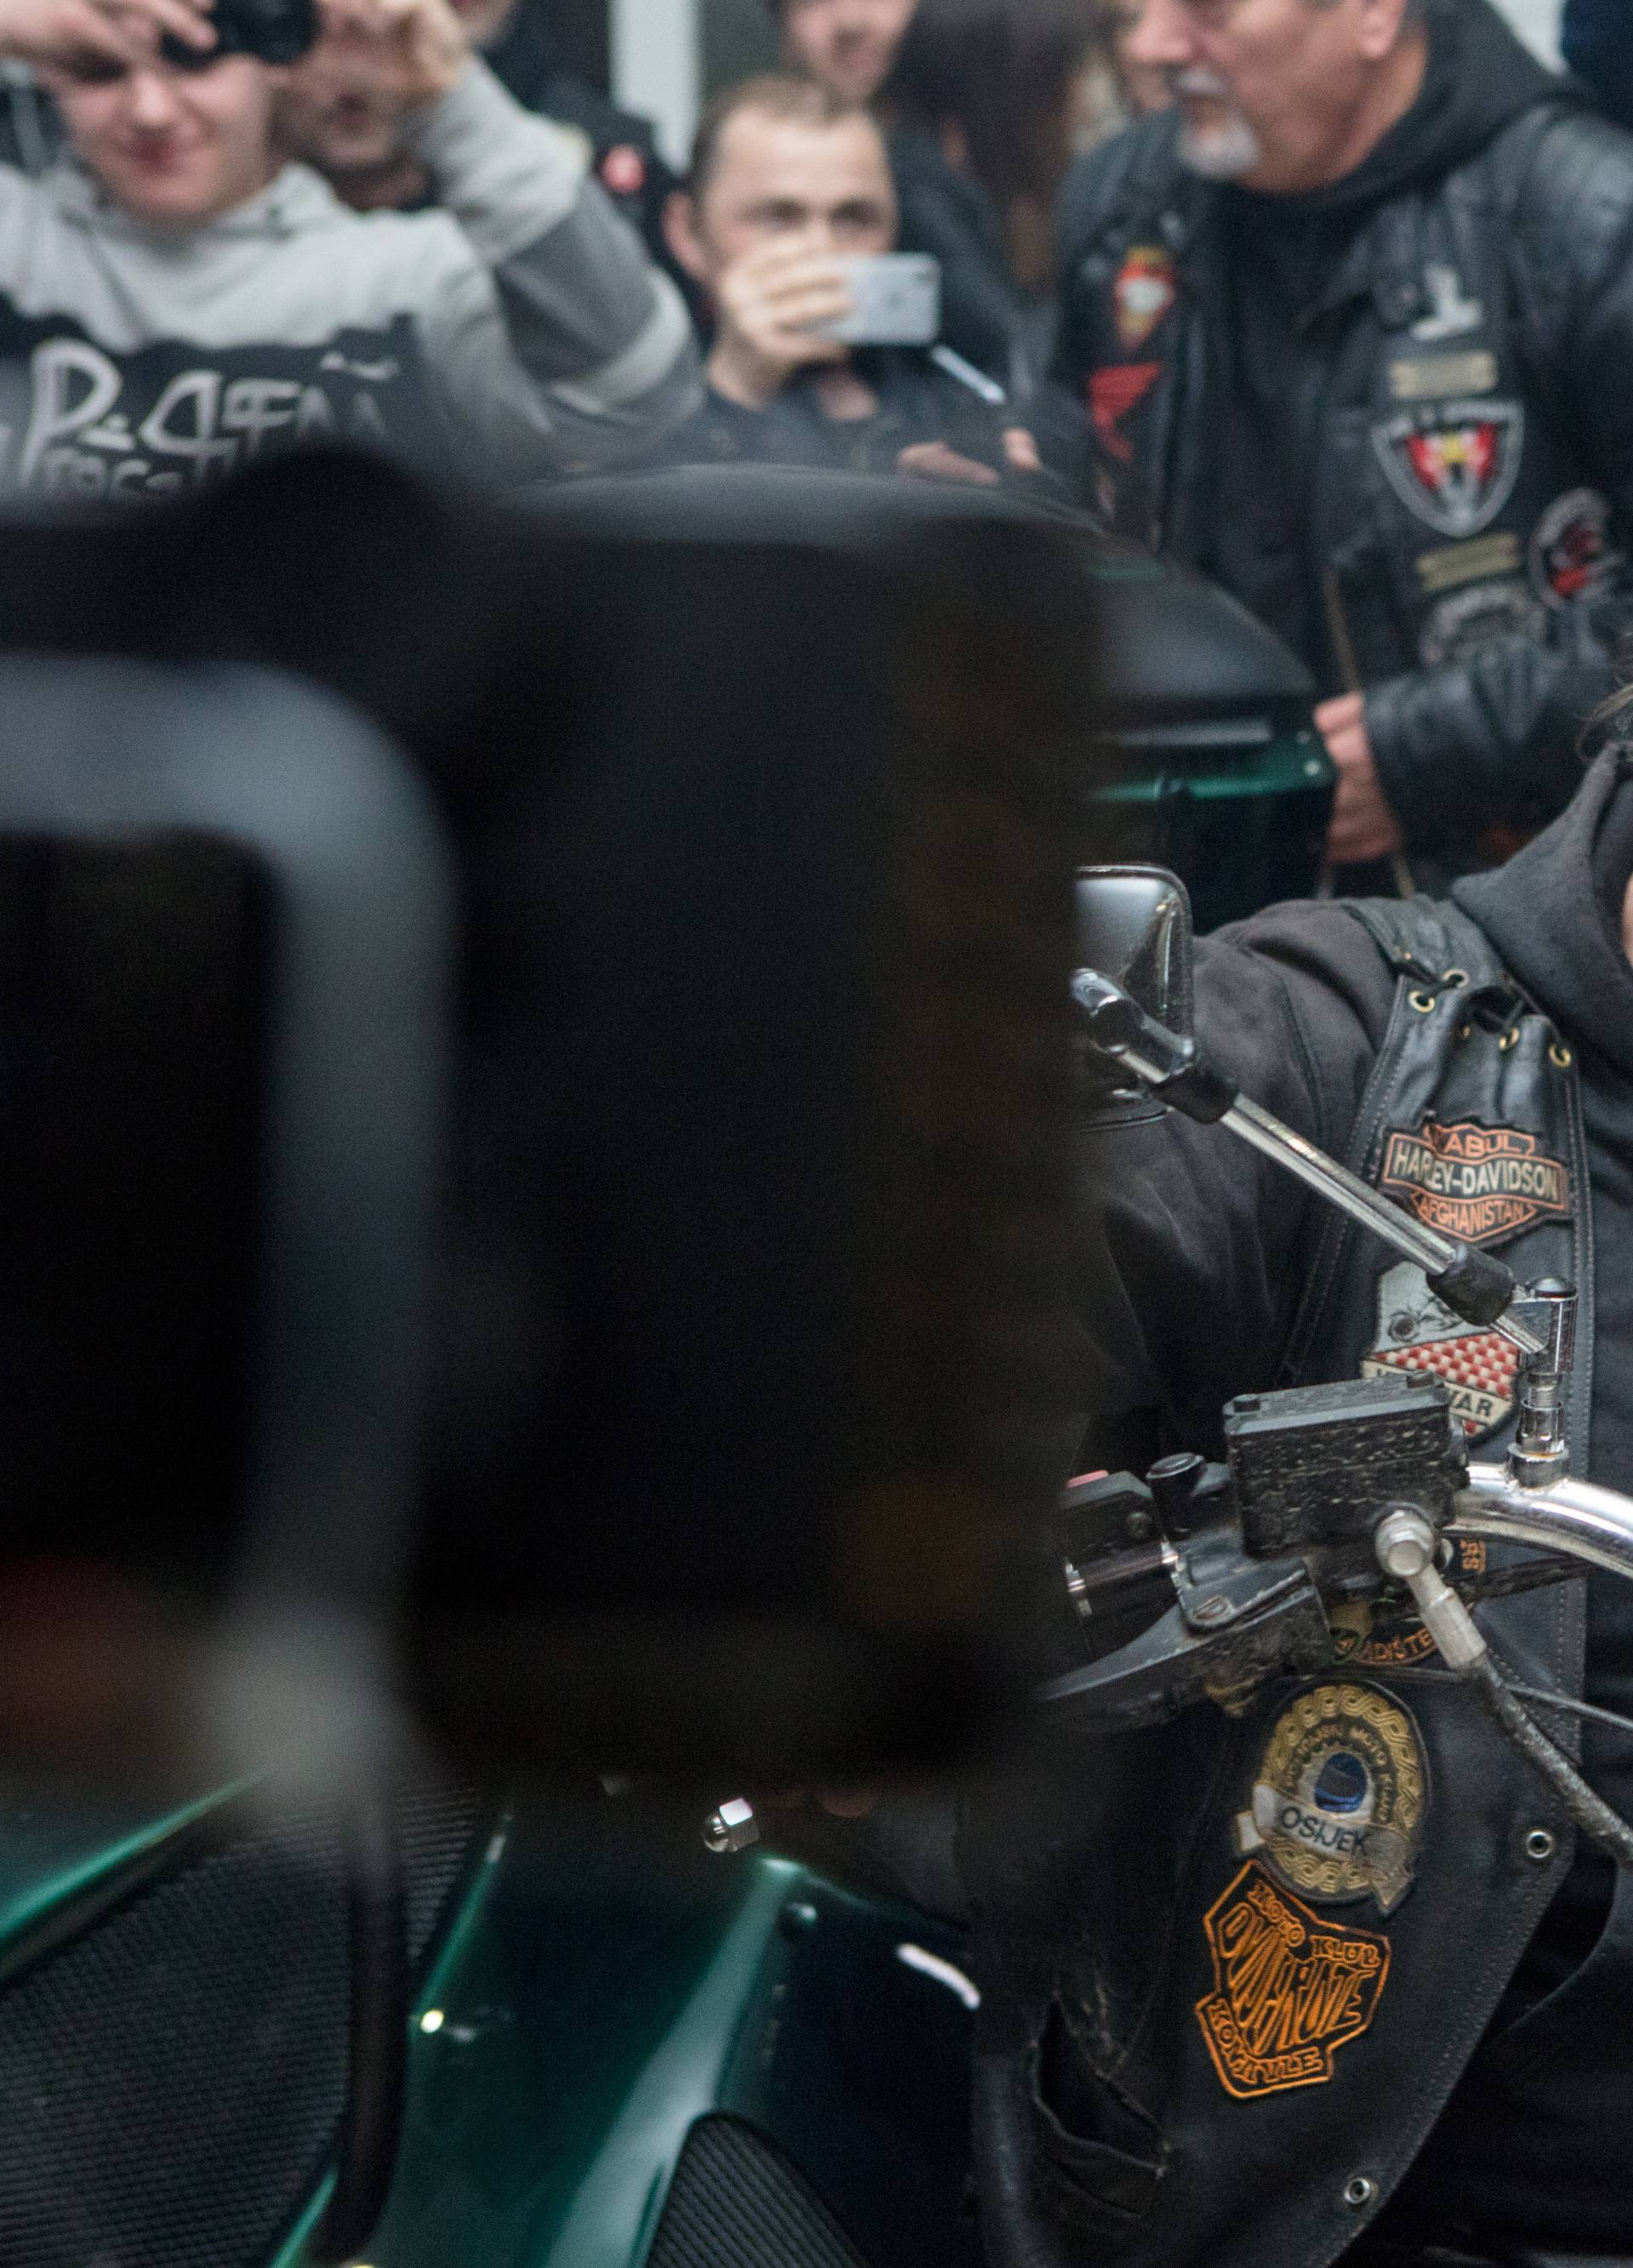 Vukovarskom heroju bez noge kolege kupili poseban motocikl